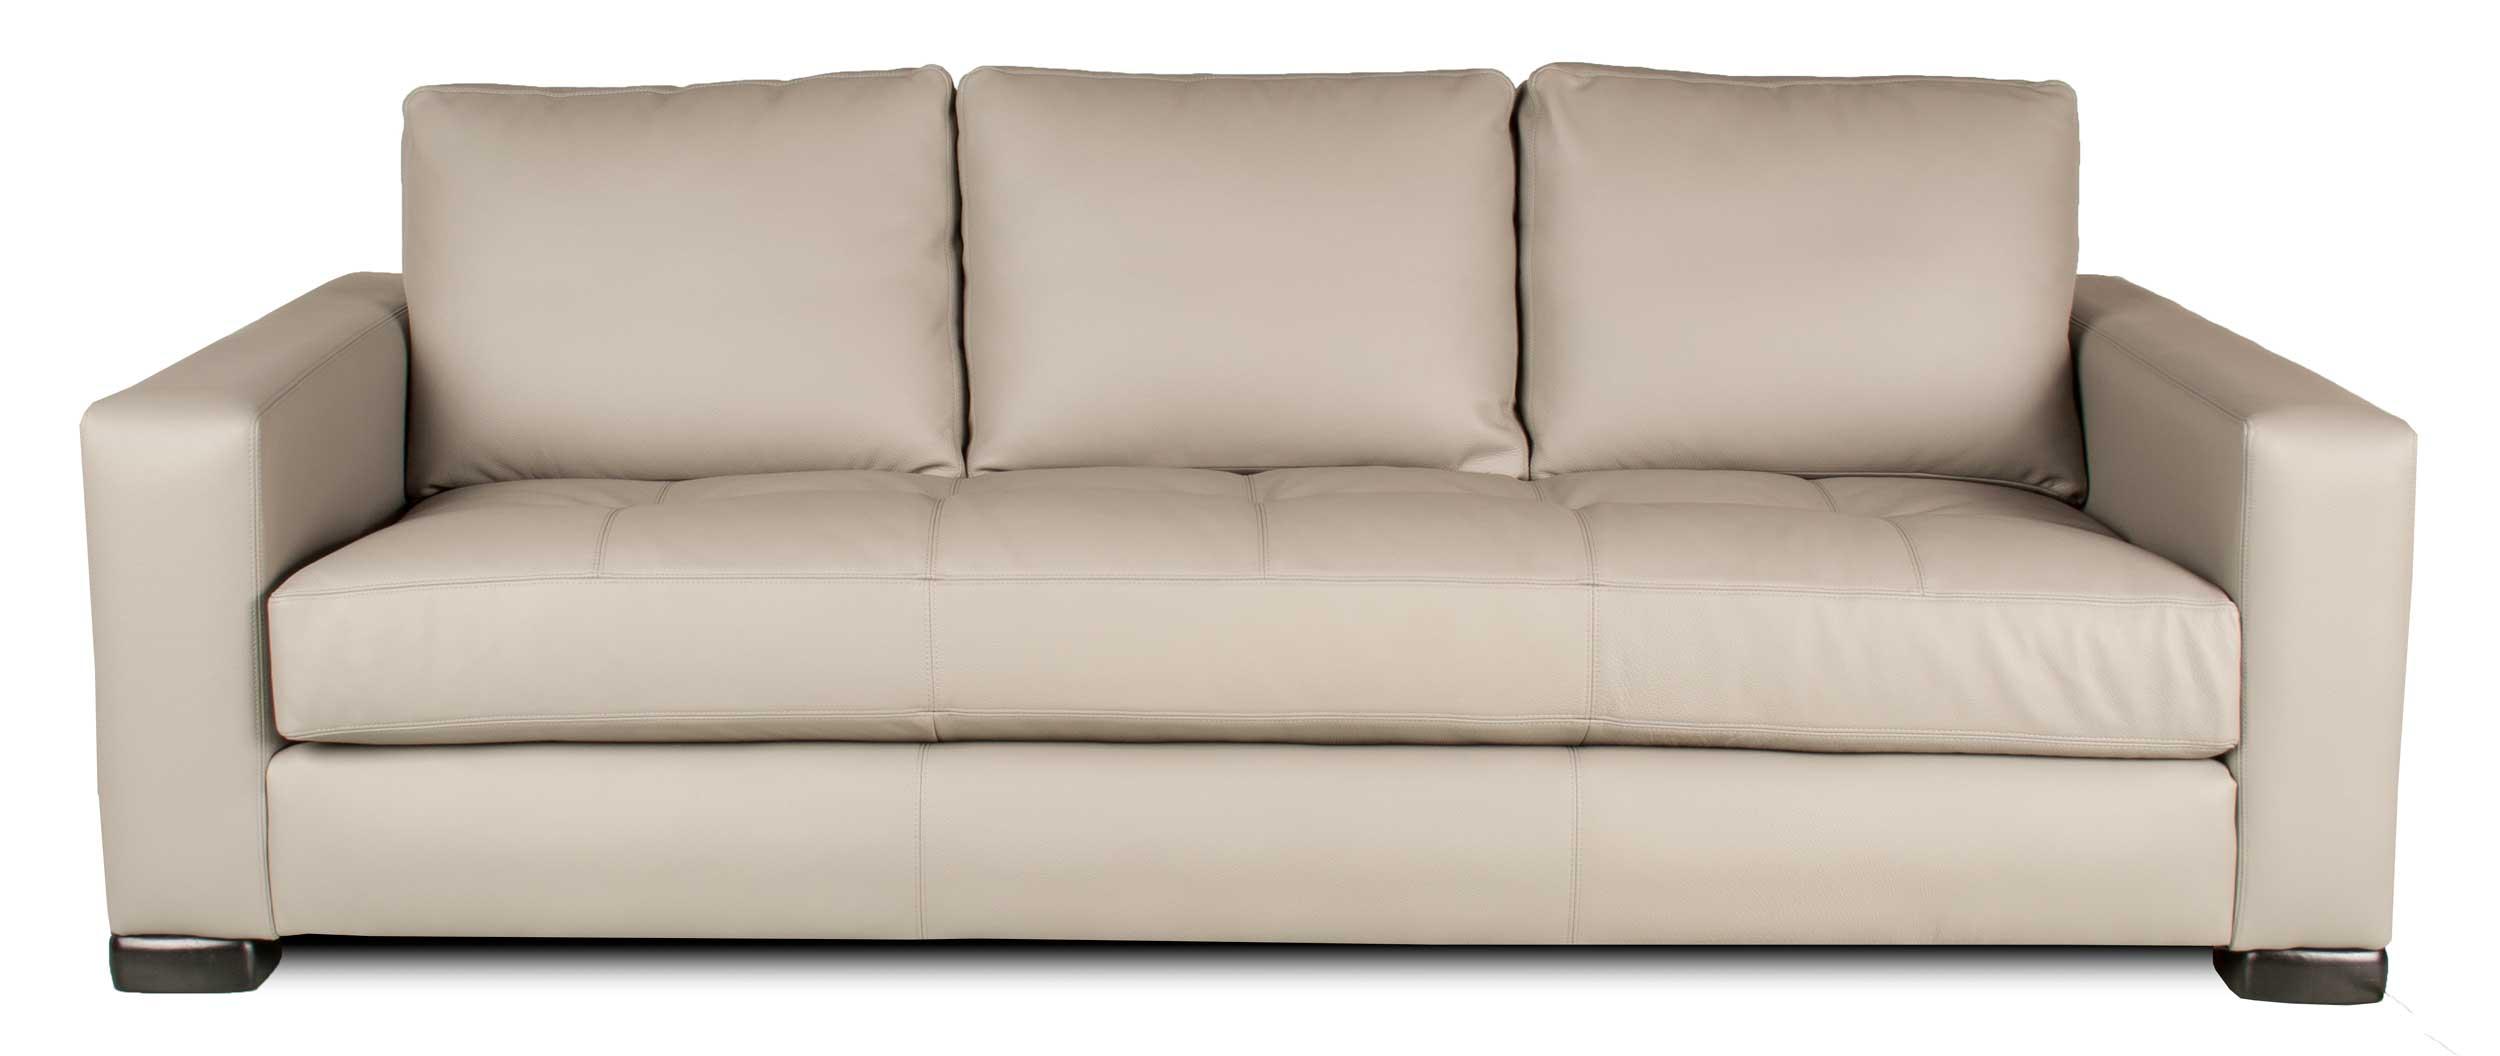 leather sofa atlanta ga corner settee bed custom couch